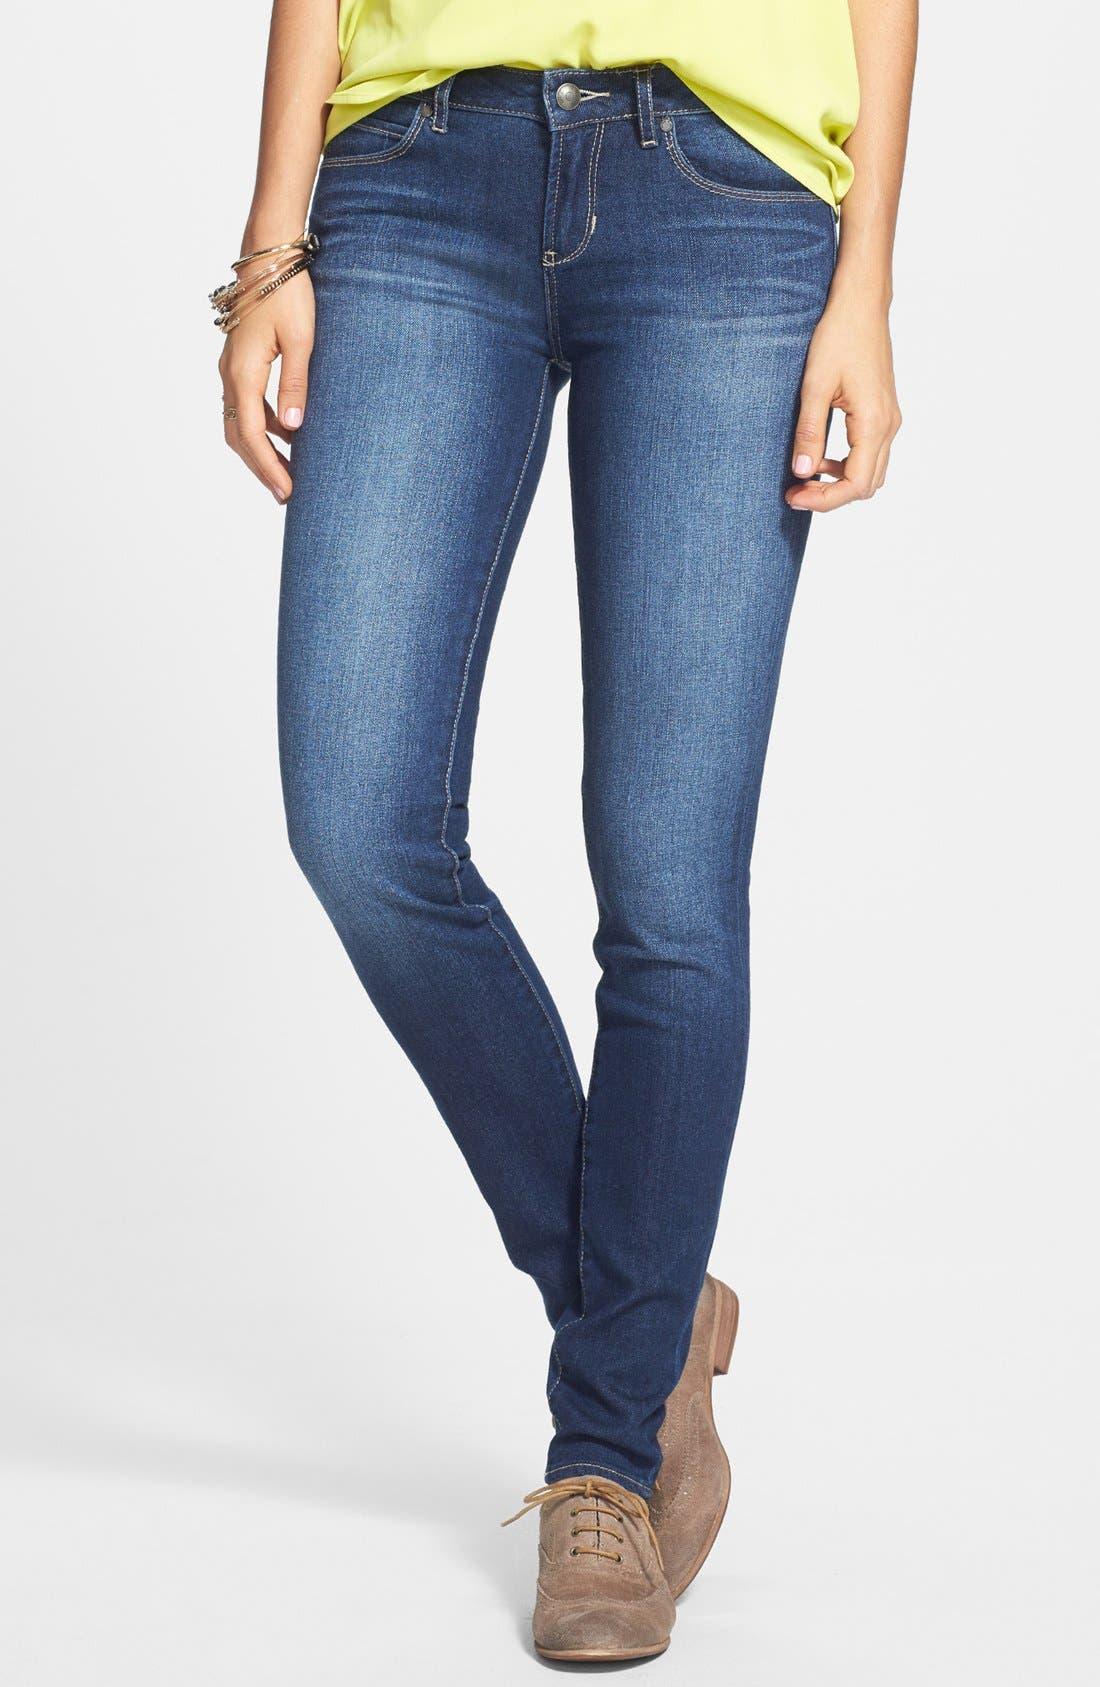 Main Image - Articles of Society 'Mya' Skinny Jeans (Dark) (Juniors)